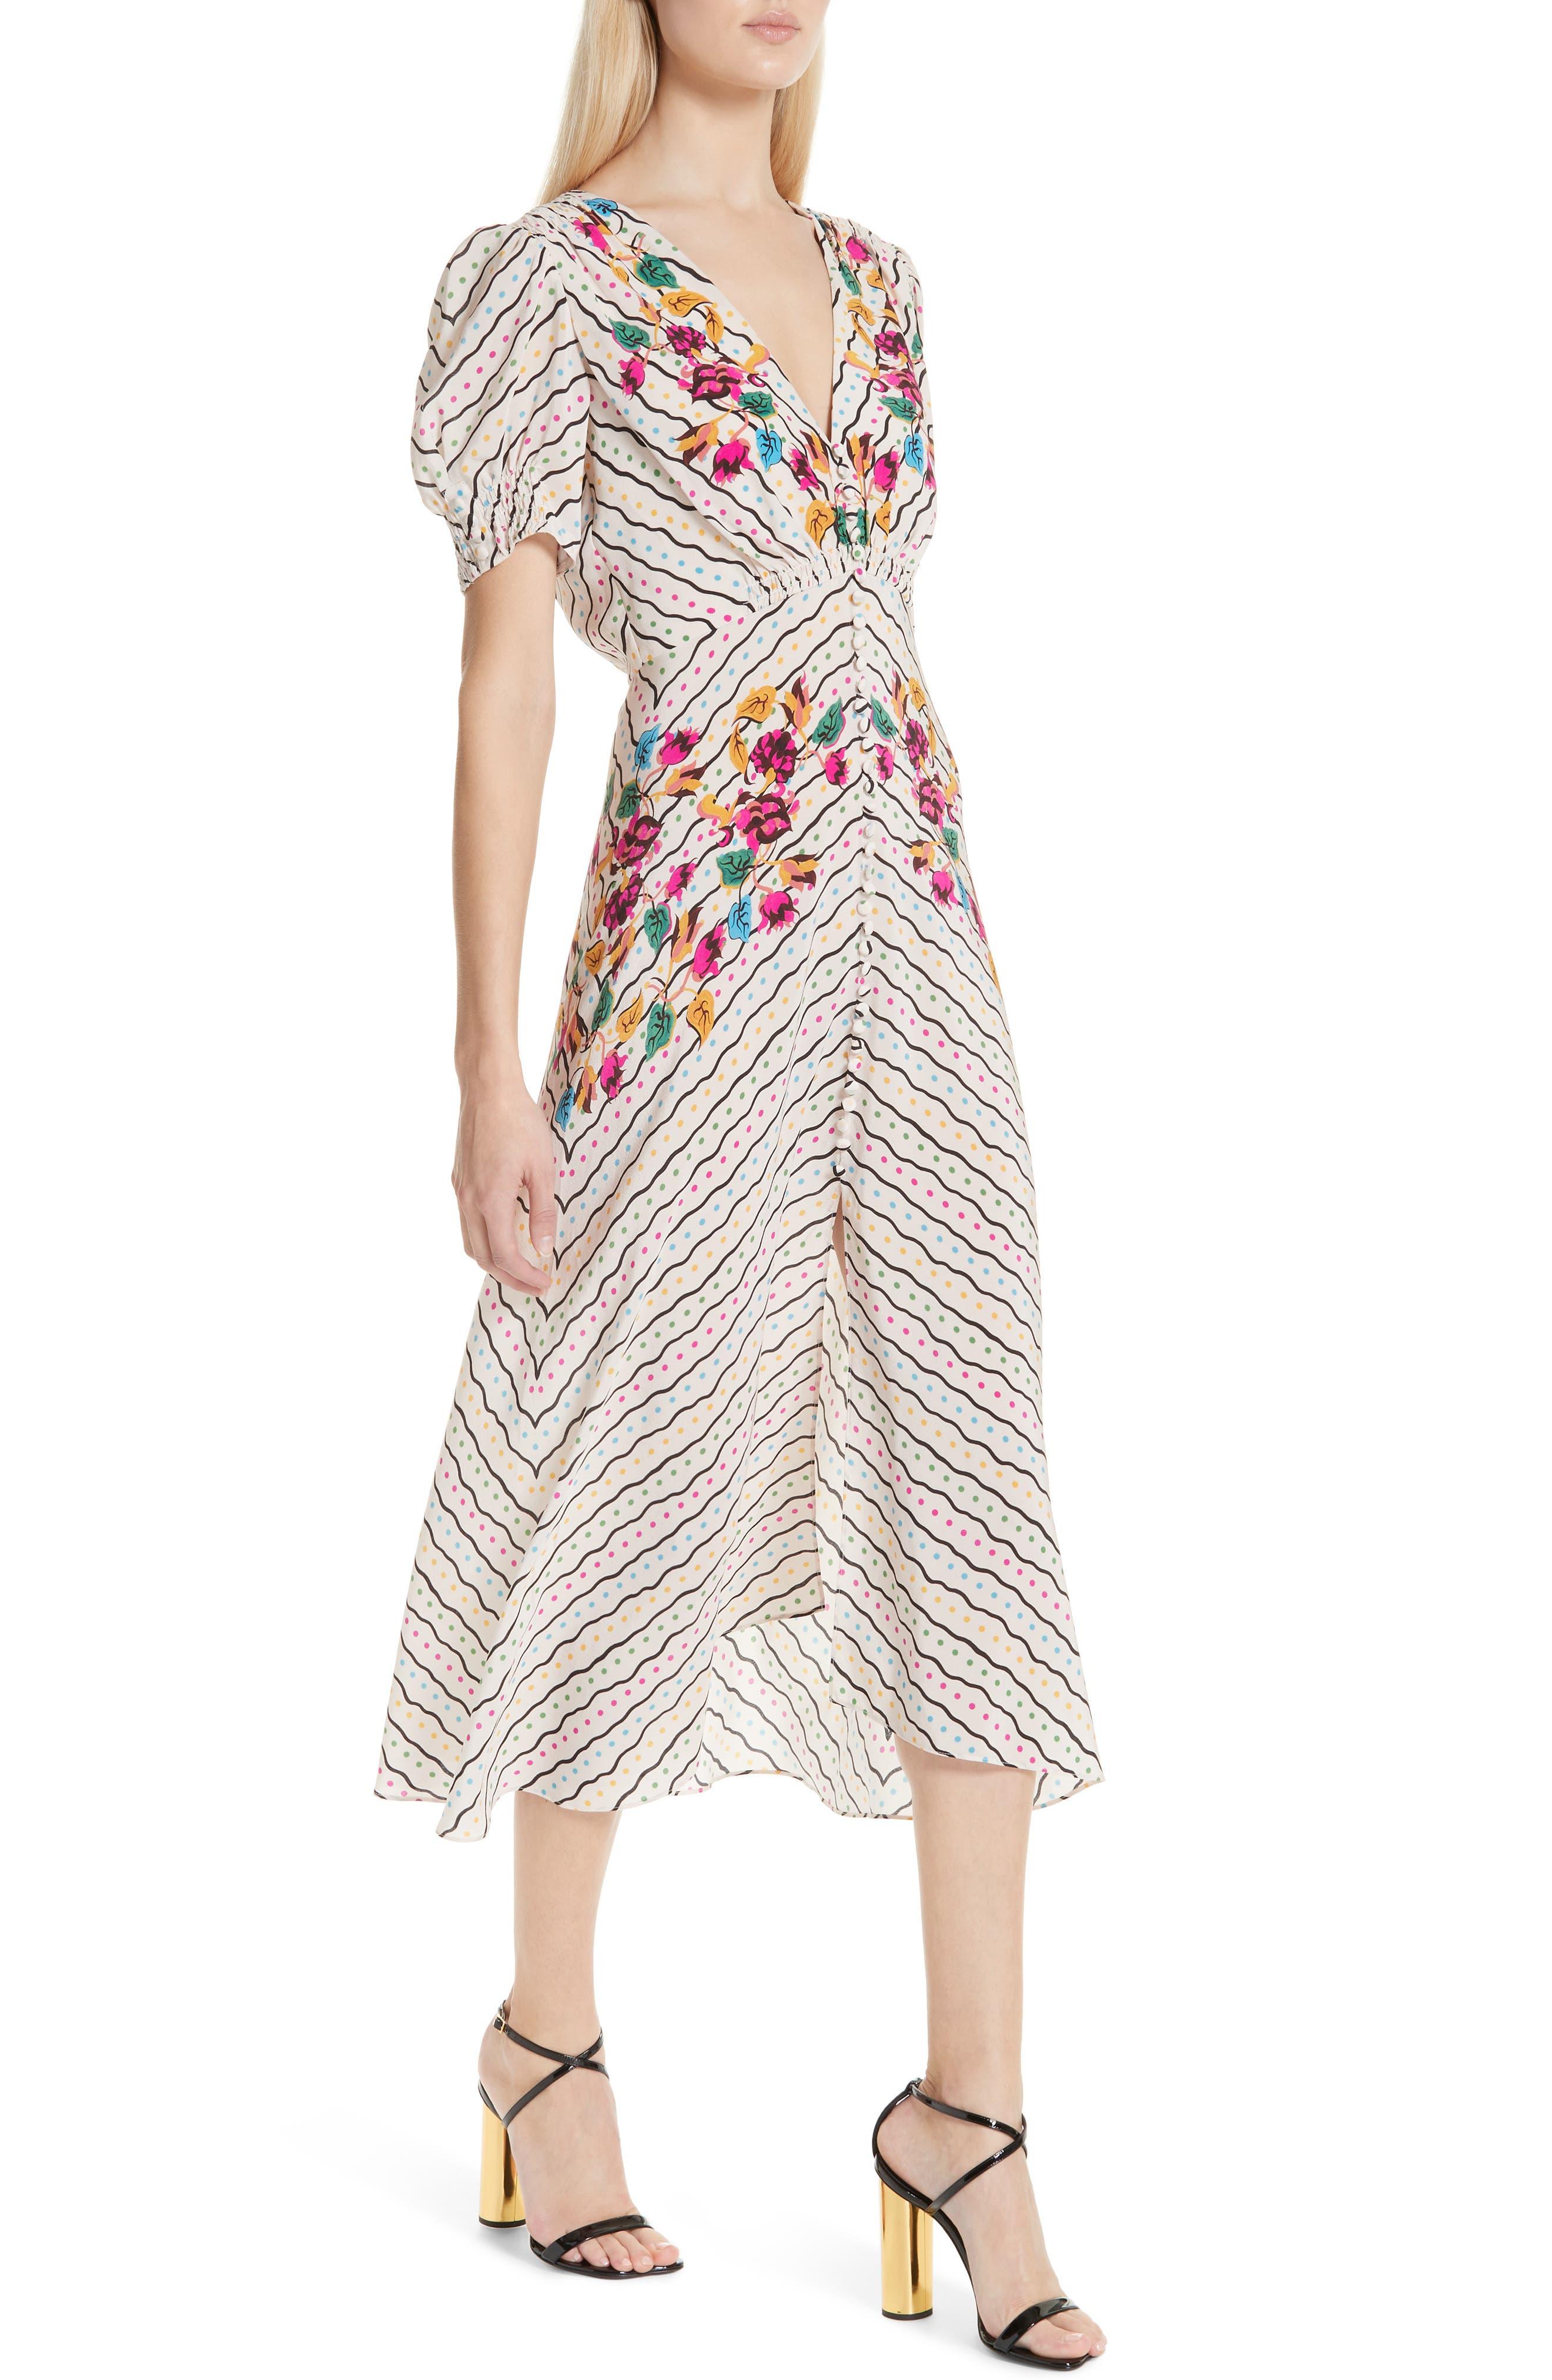 SALONI, Lea Silk Midi Dress, Alternate thumbnail 5, color, JAPONICA WIGGLE PLACEMENT